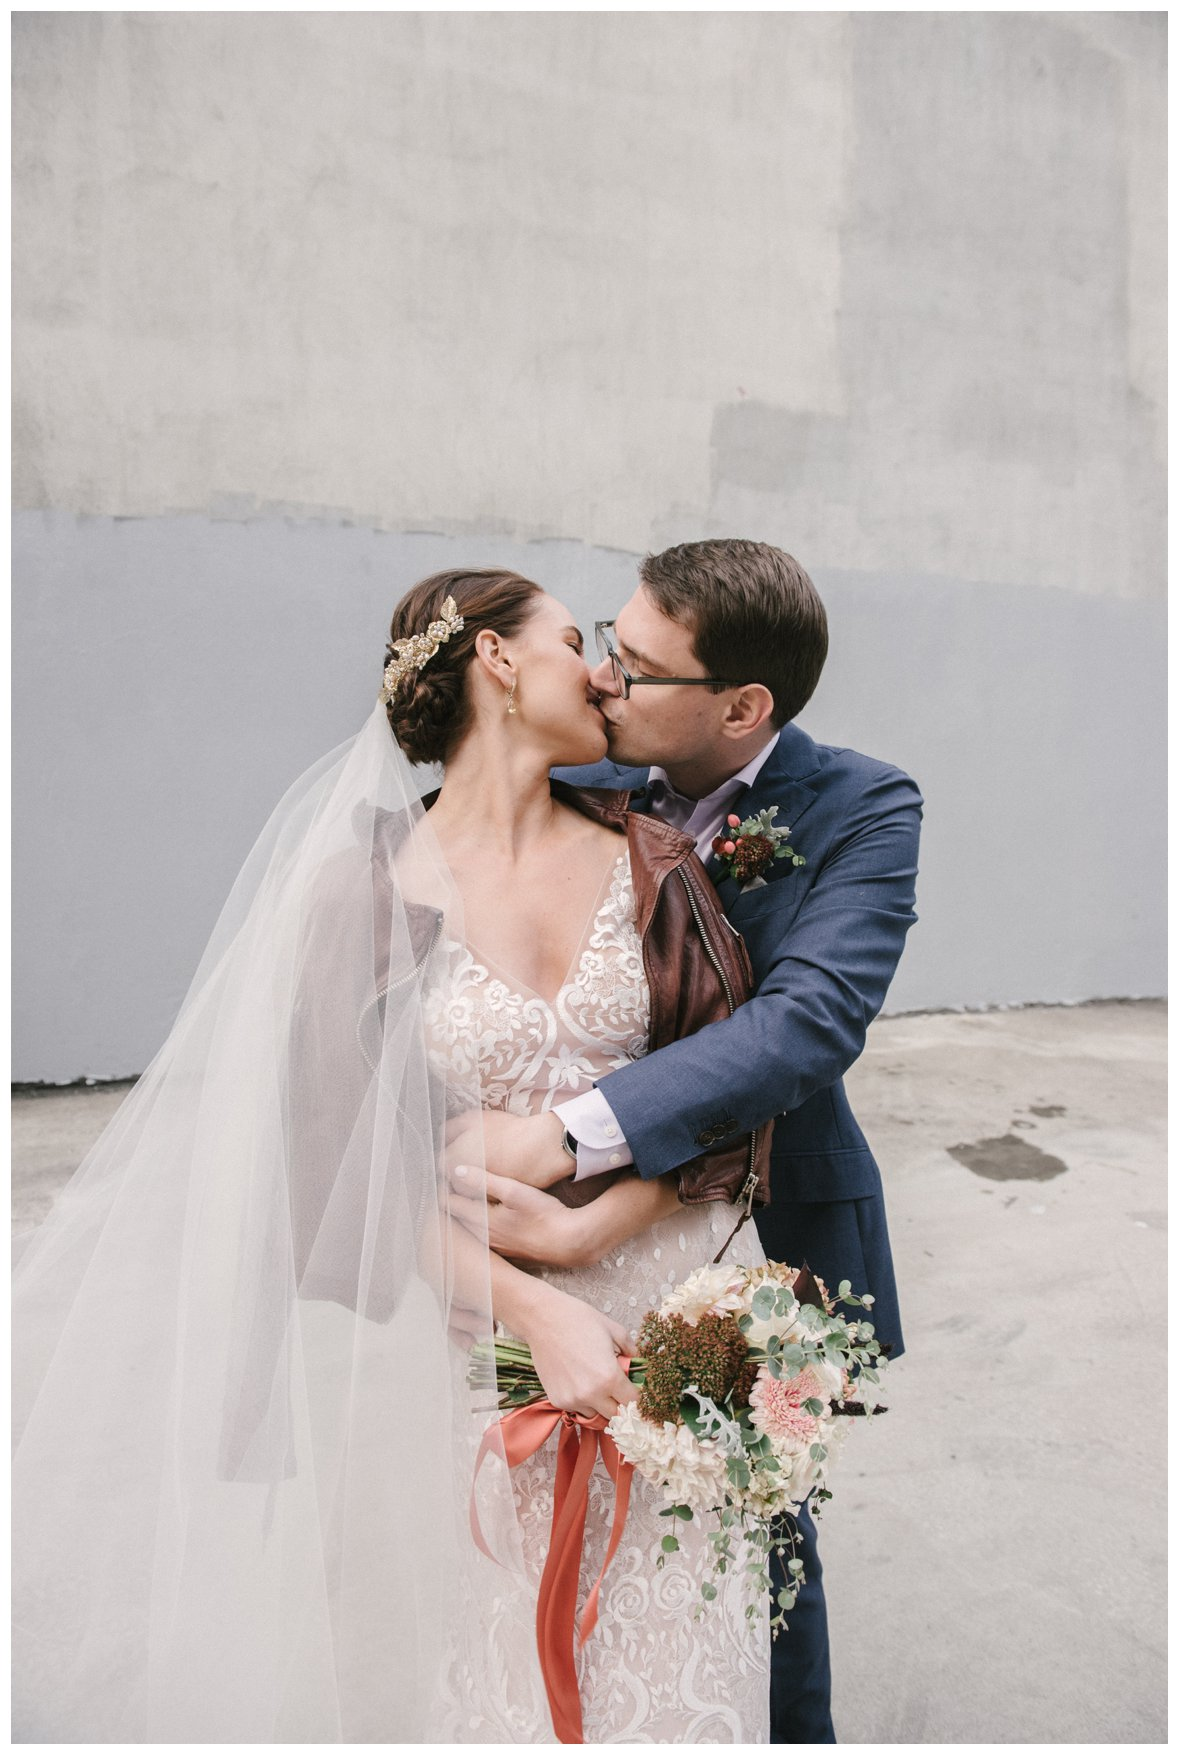 Frankies brooklyn wedding_0298.jpg